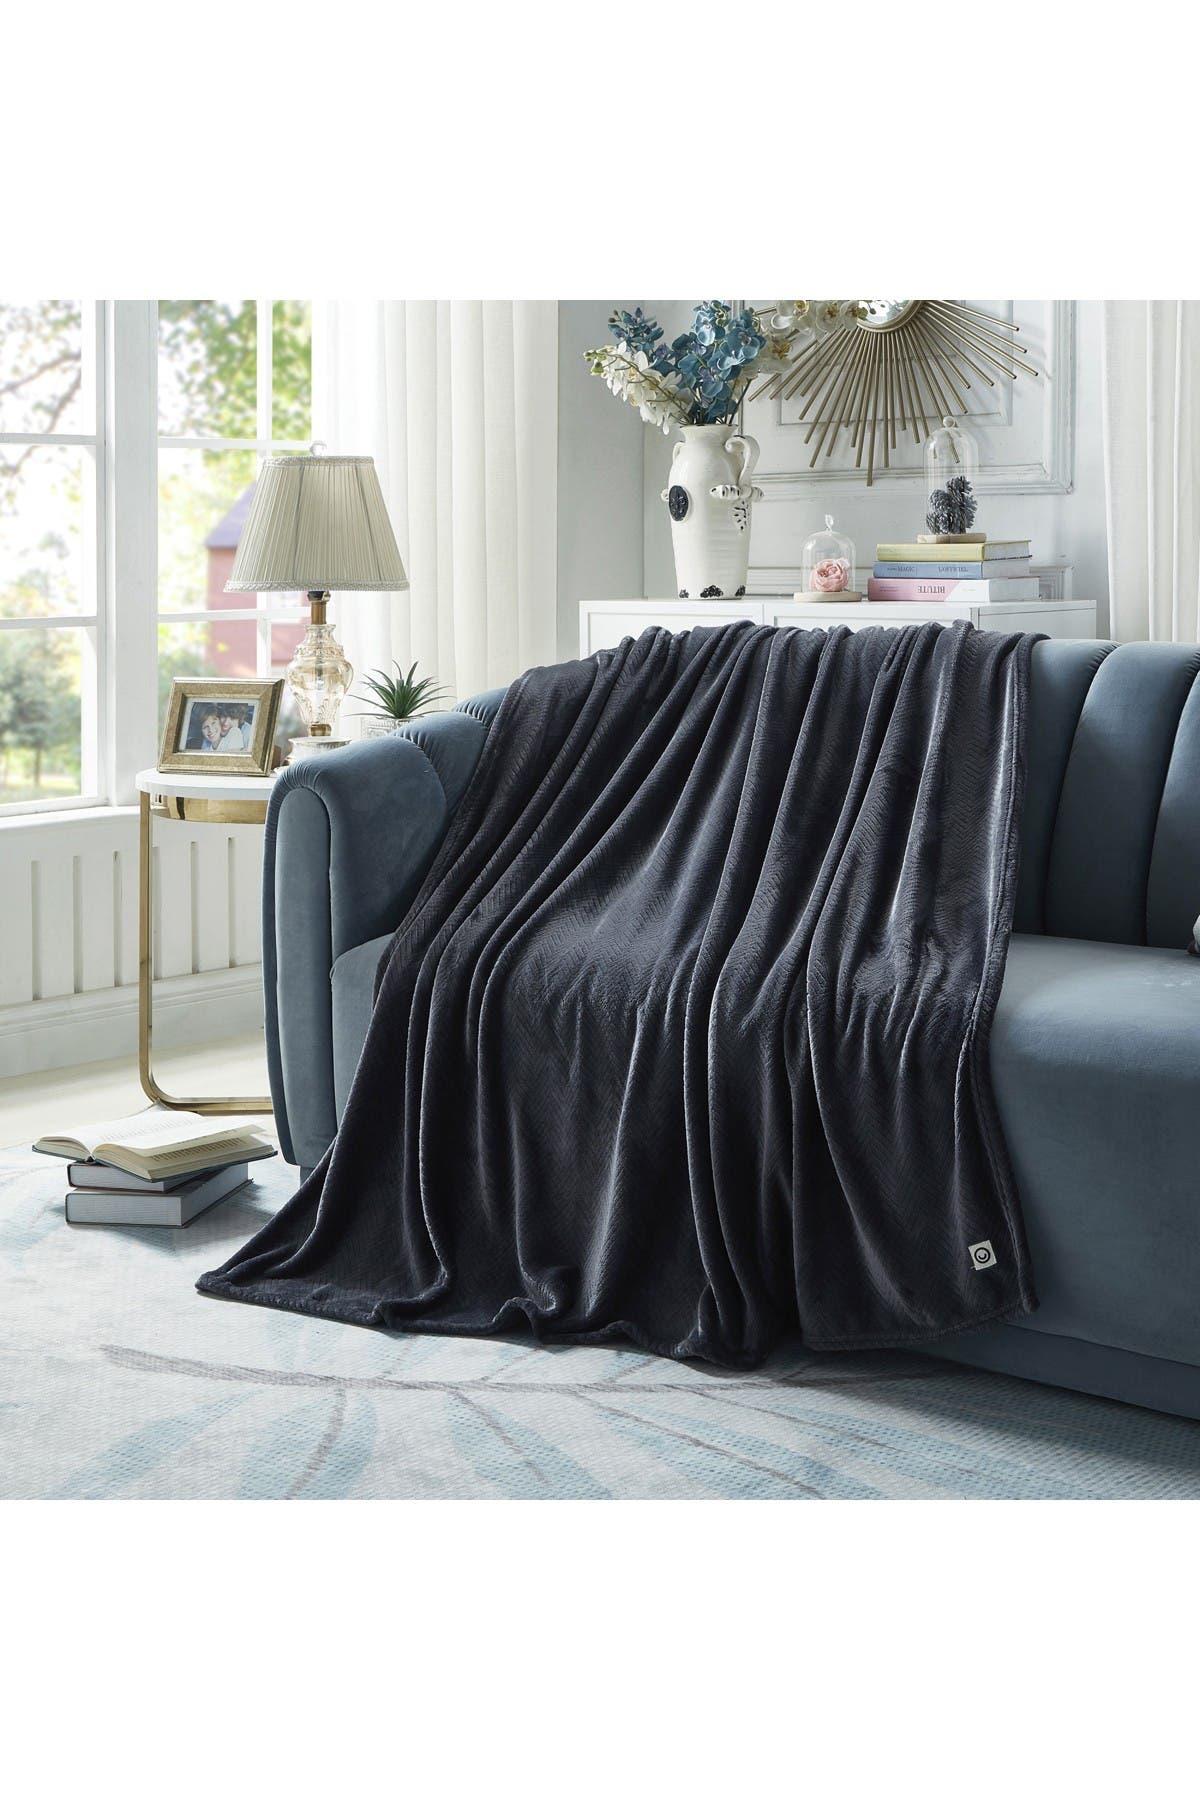 "Image of Inspired Home Cozy Tyme Siyanda Chevron Flannel Reversible Jacquard Throw 60"" x 70"" - Dark Grey"